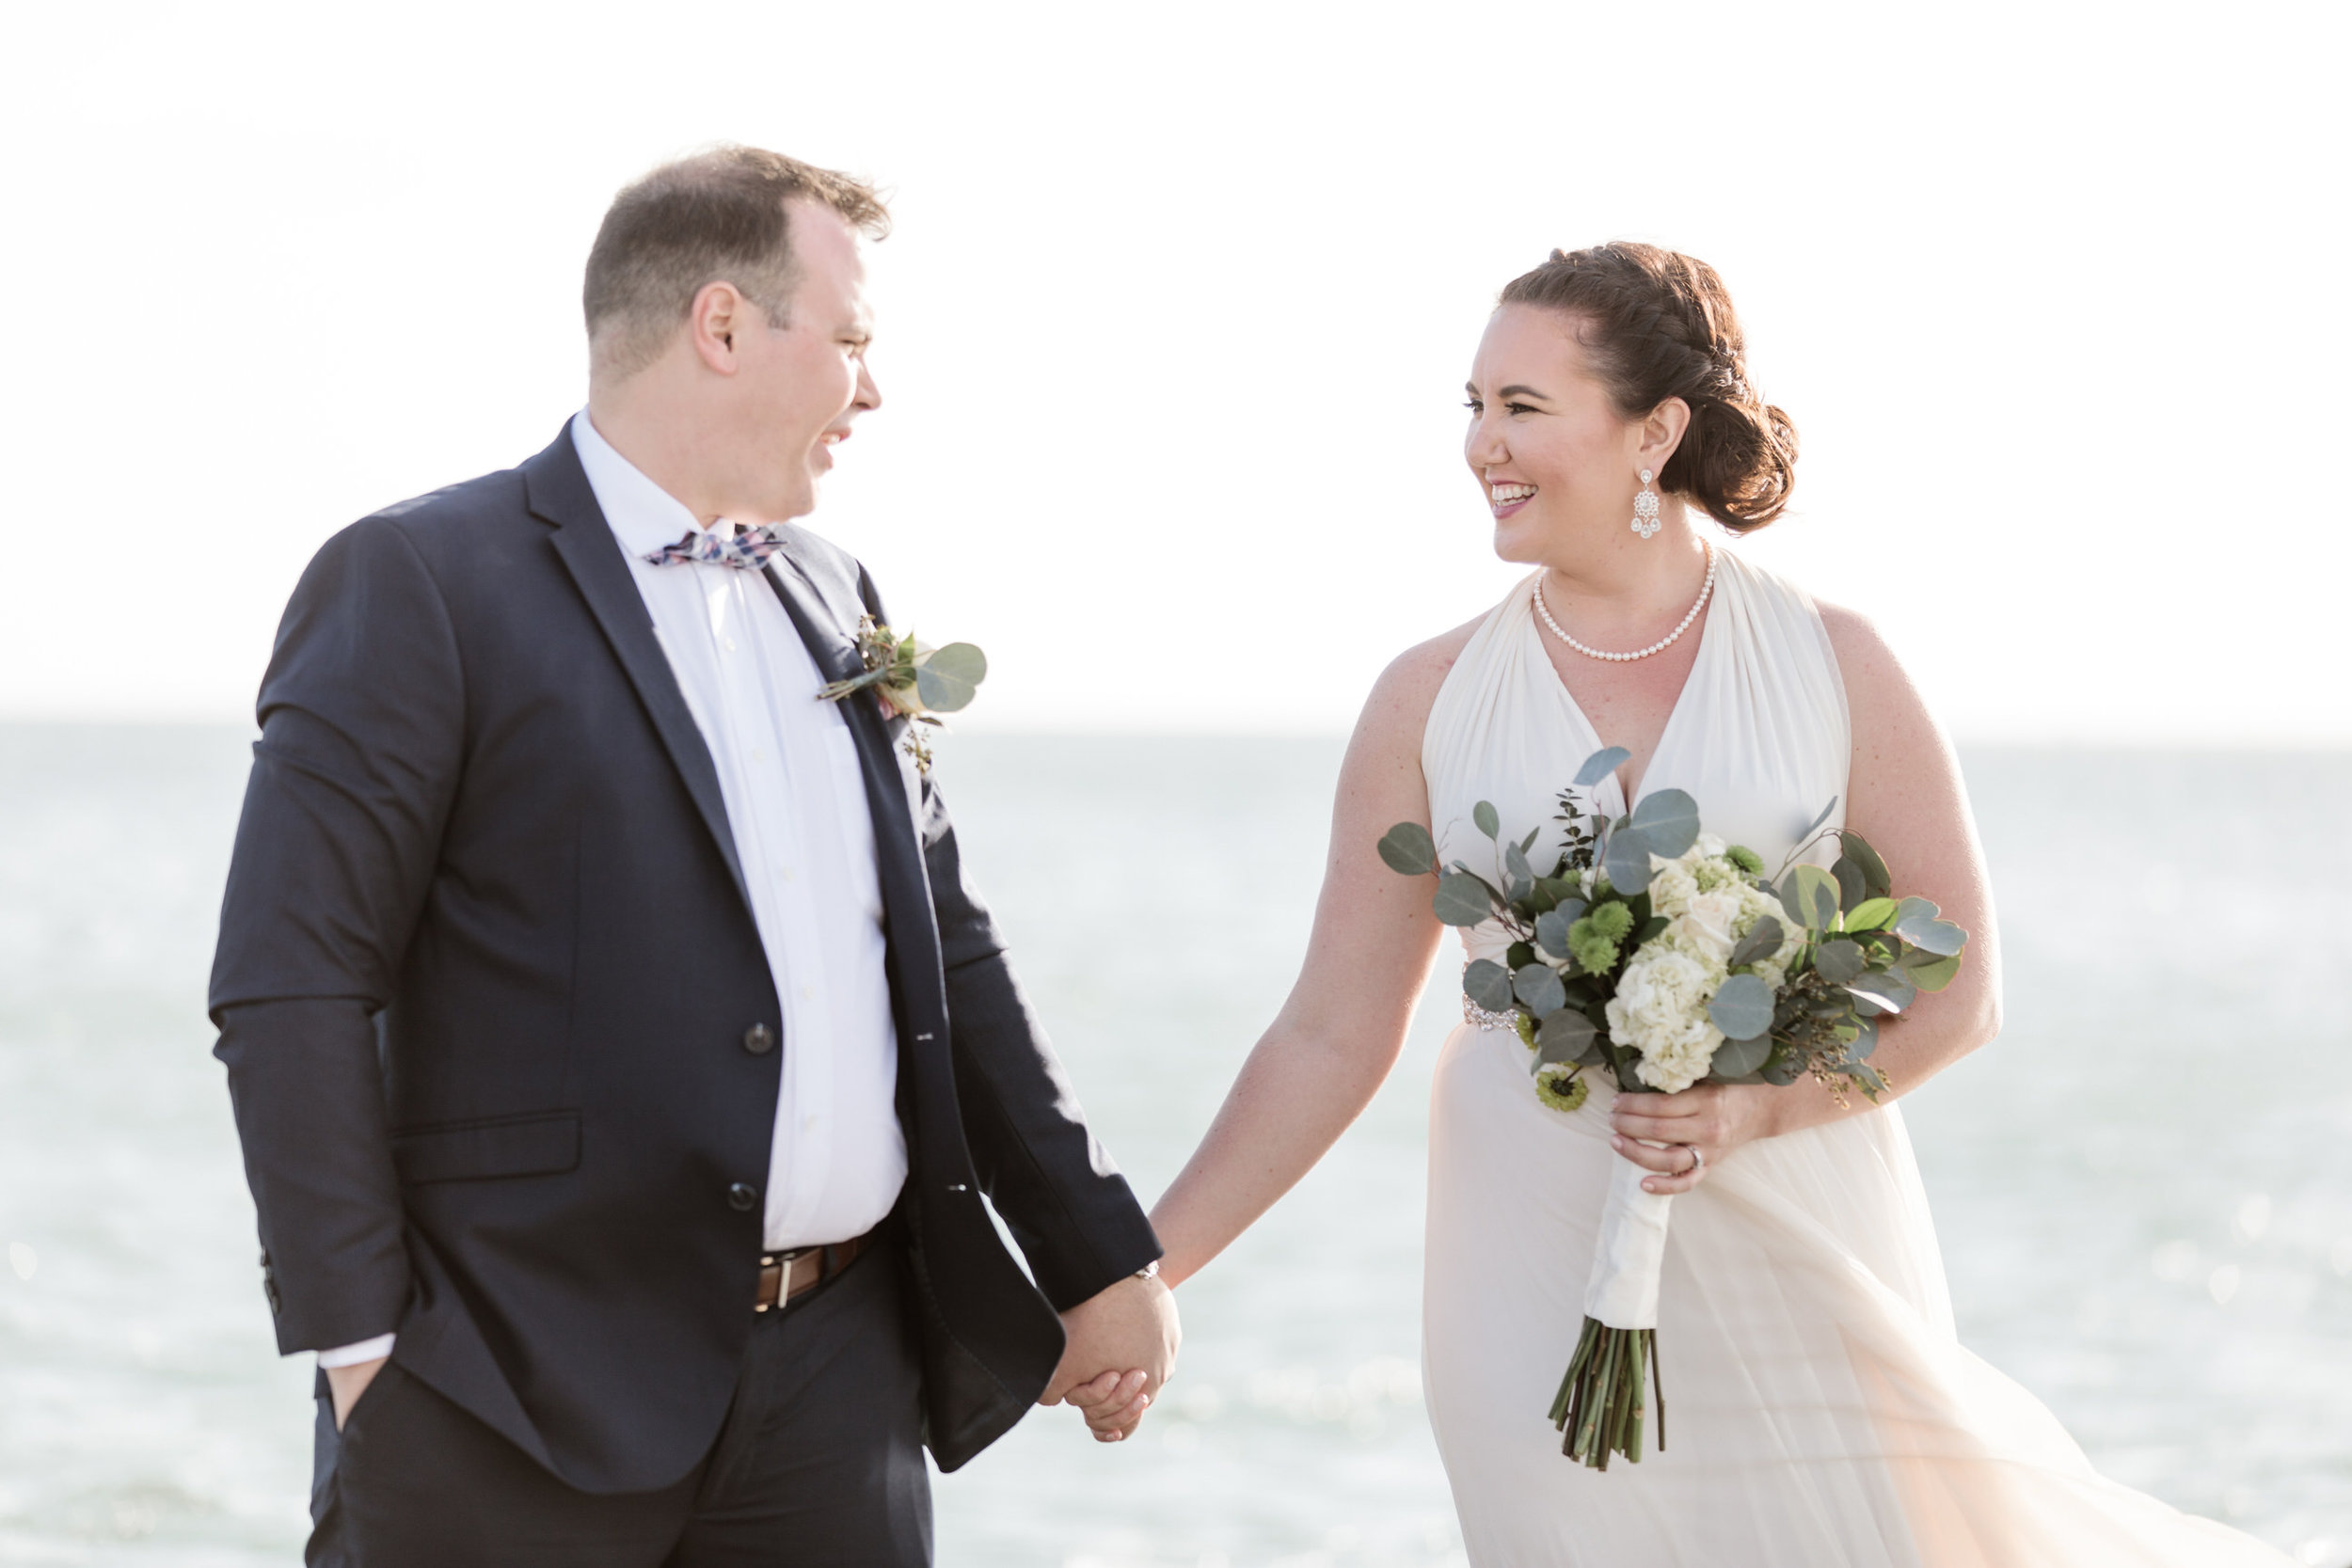 Beltran_Treasure_Island_Elopement_Tampa_Wedding_047-1.jpg